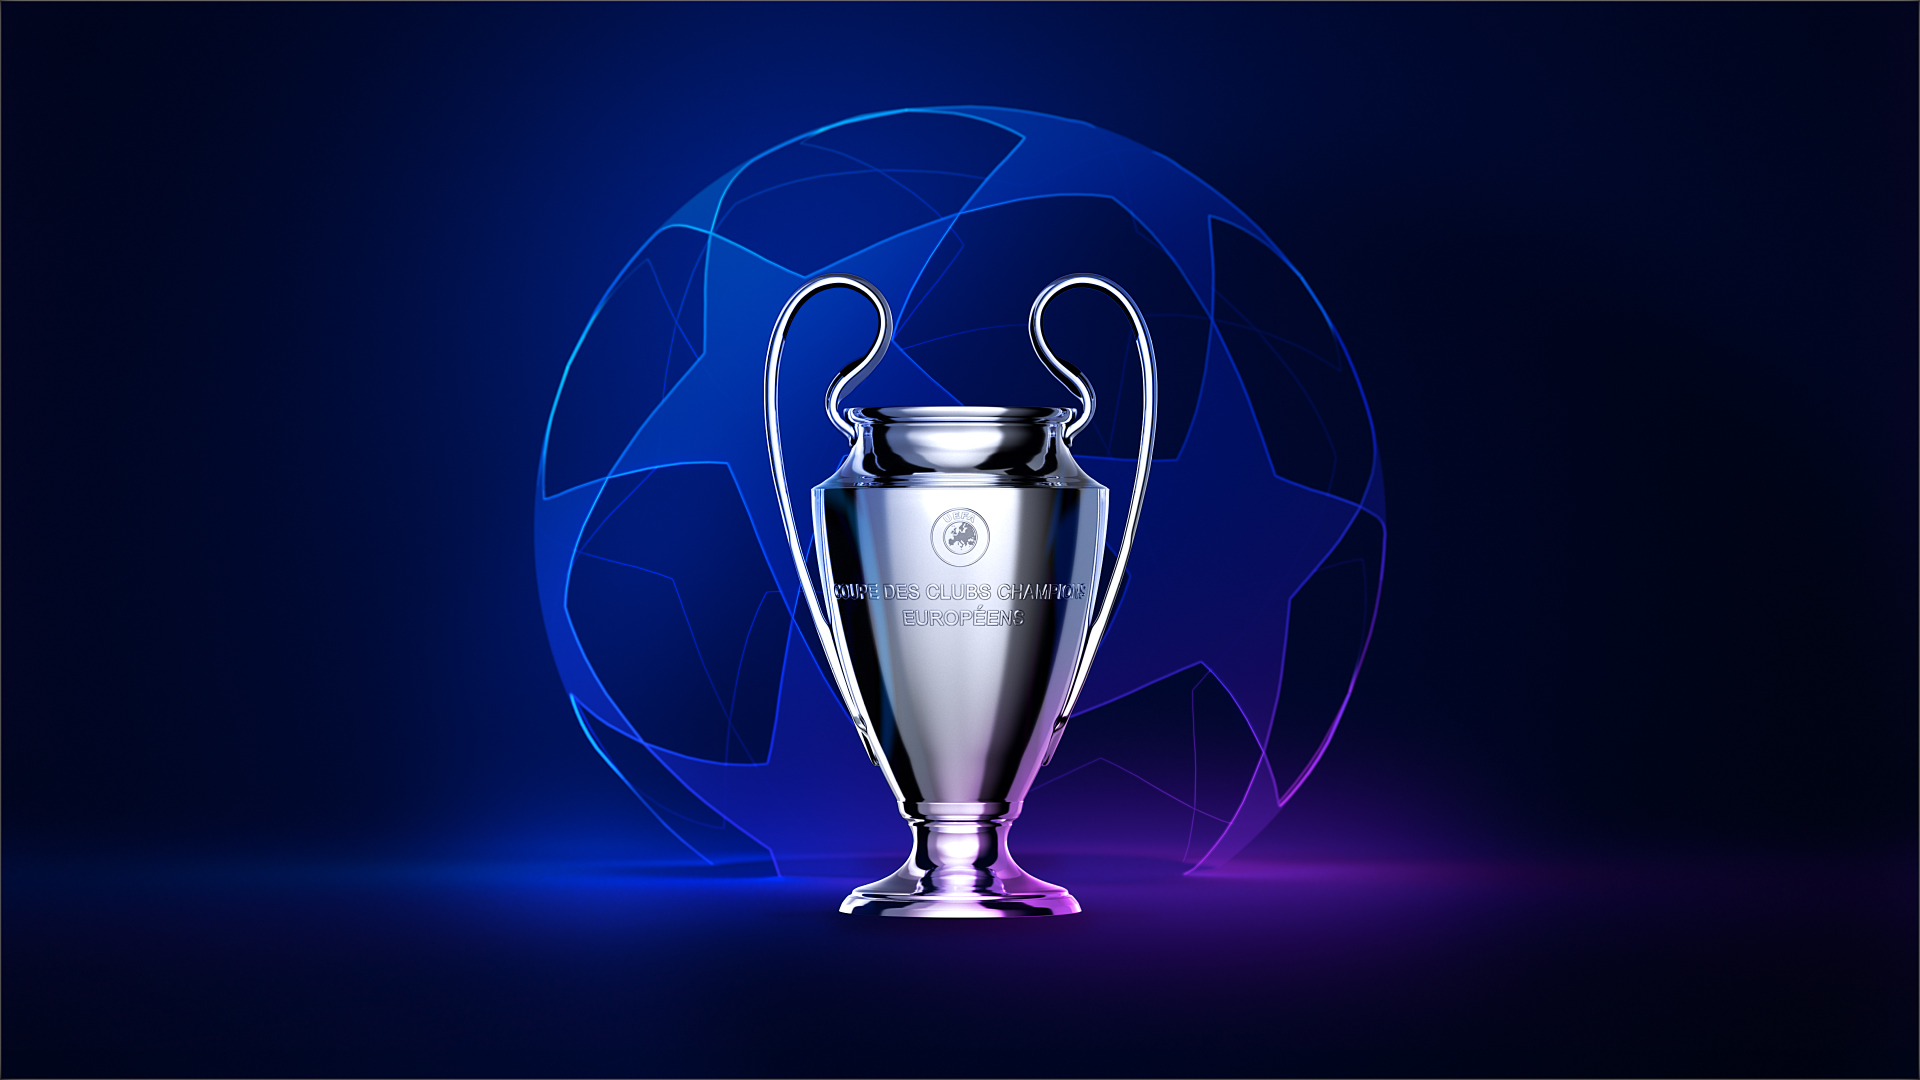 Copy of UEFA Champion's League